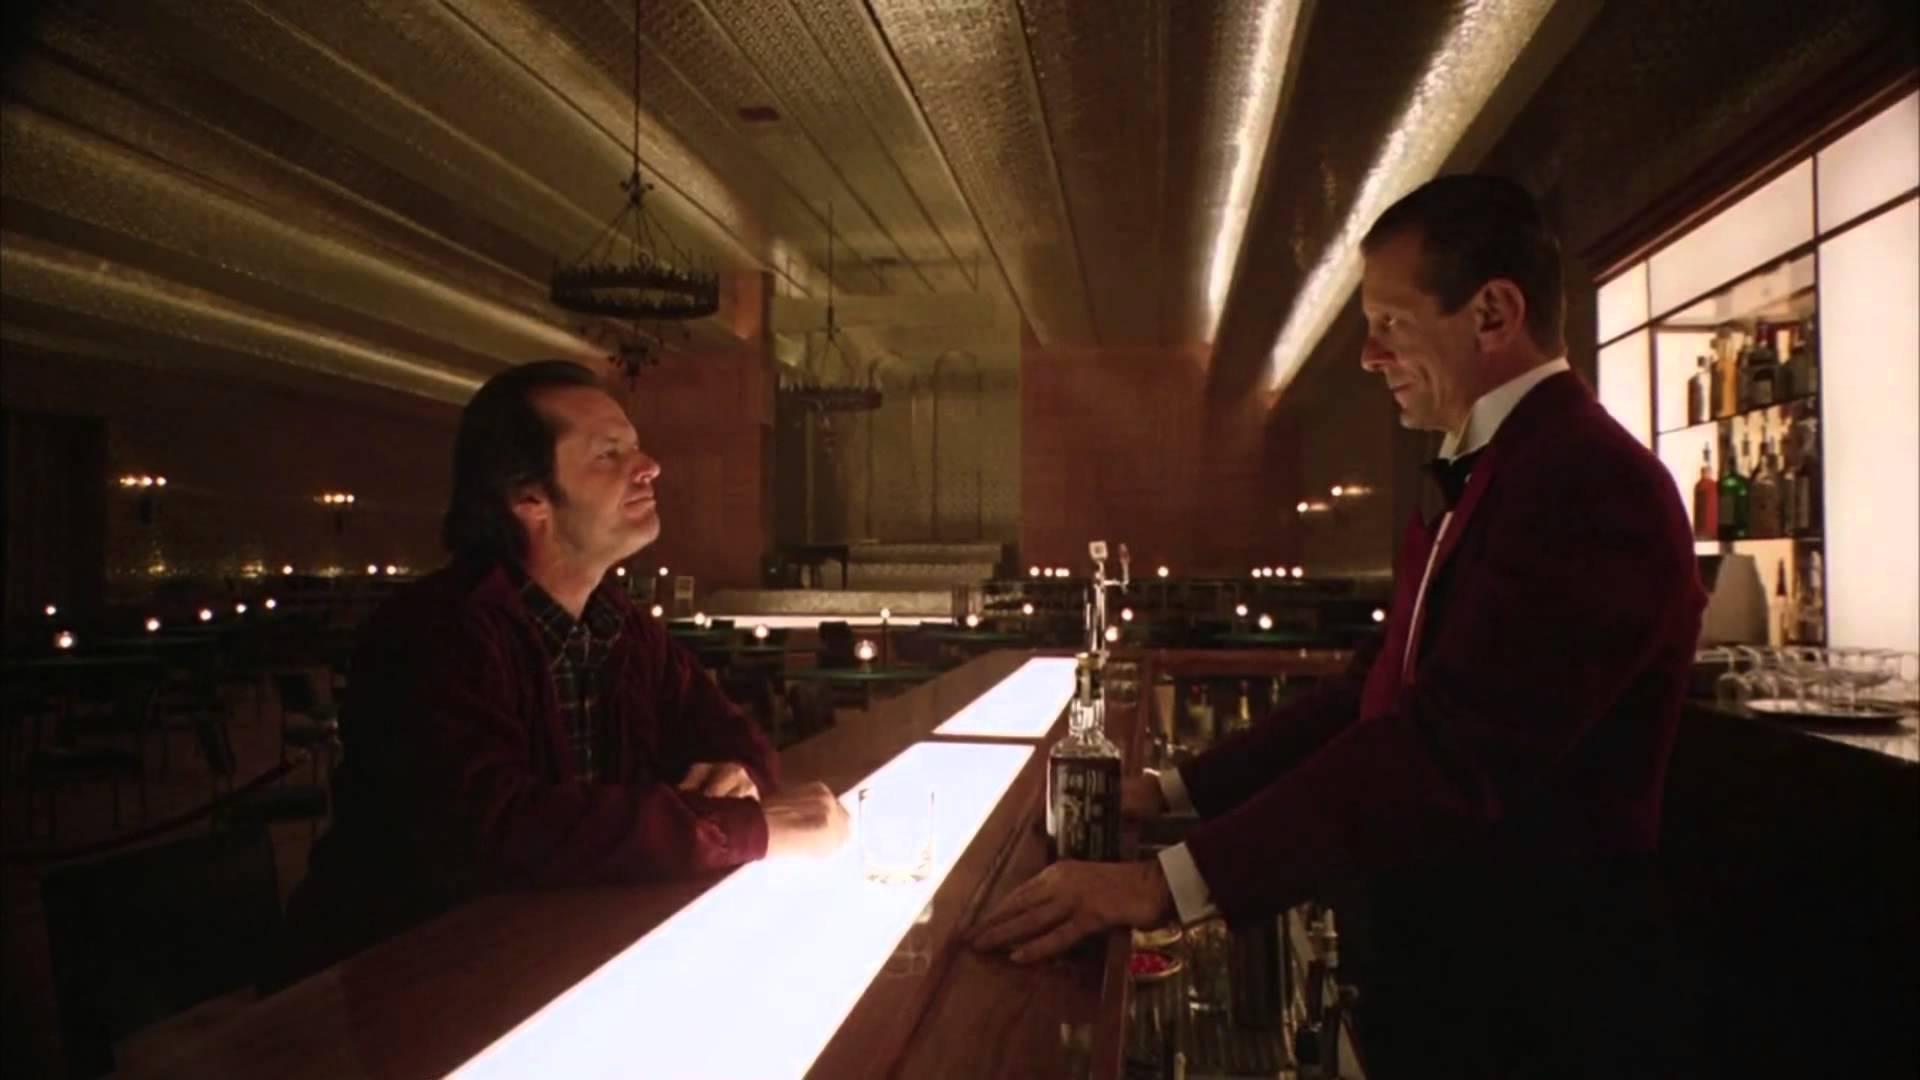 The Overlook Hotel bar scene in The Shining